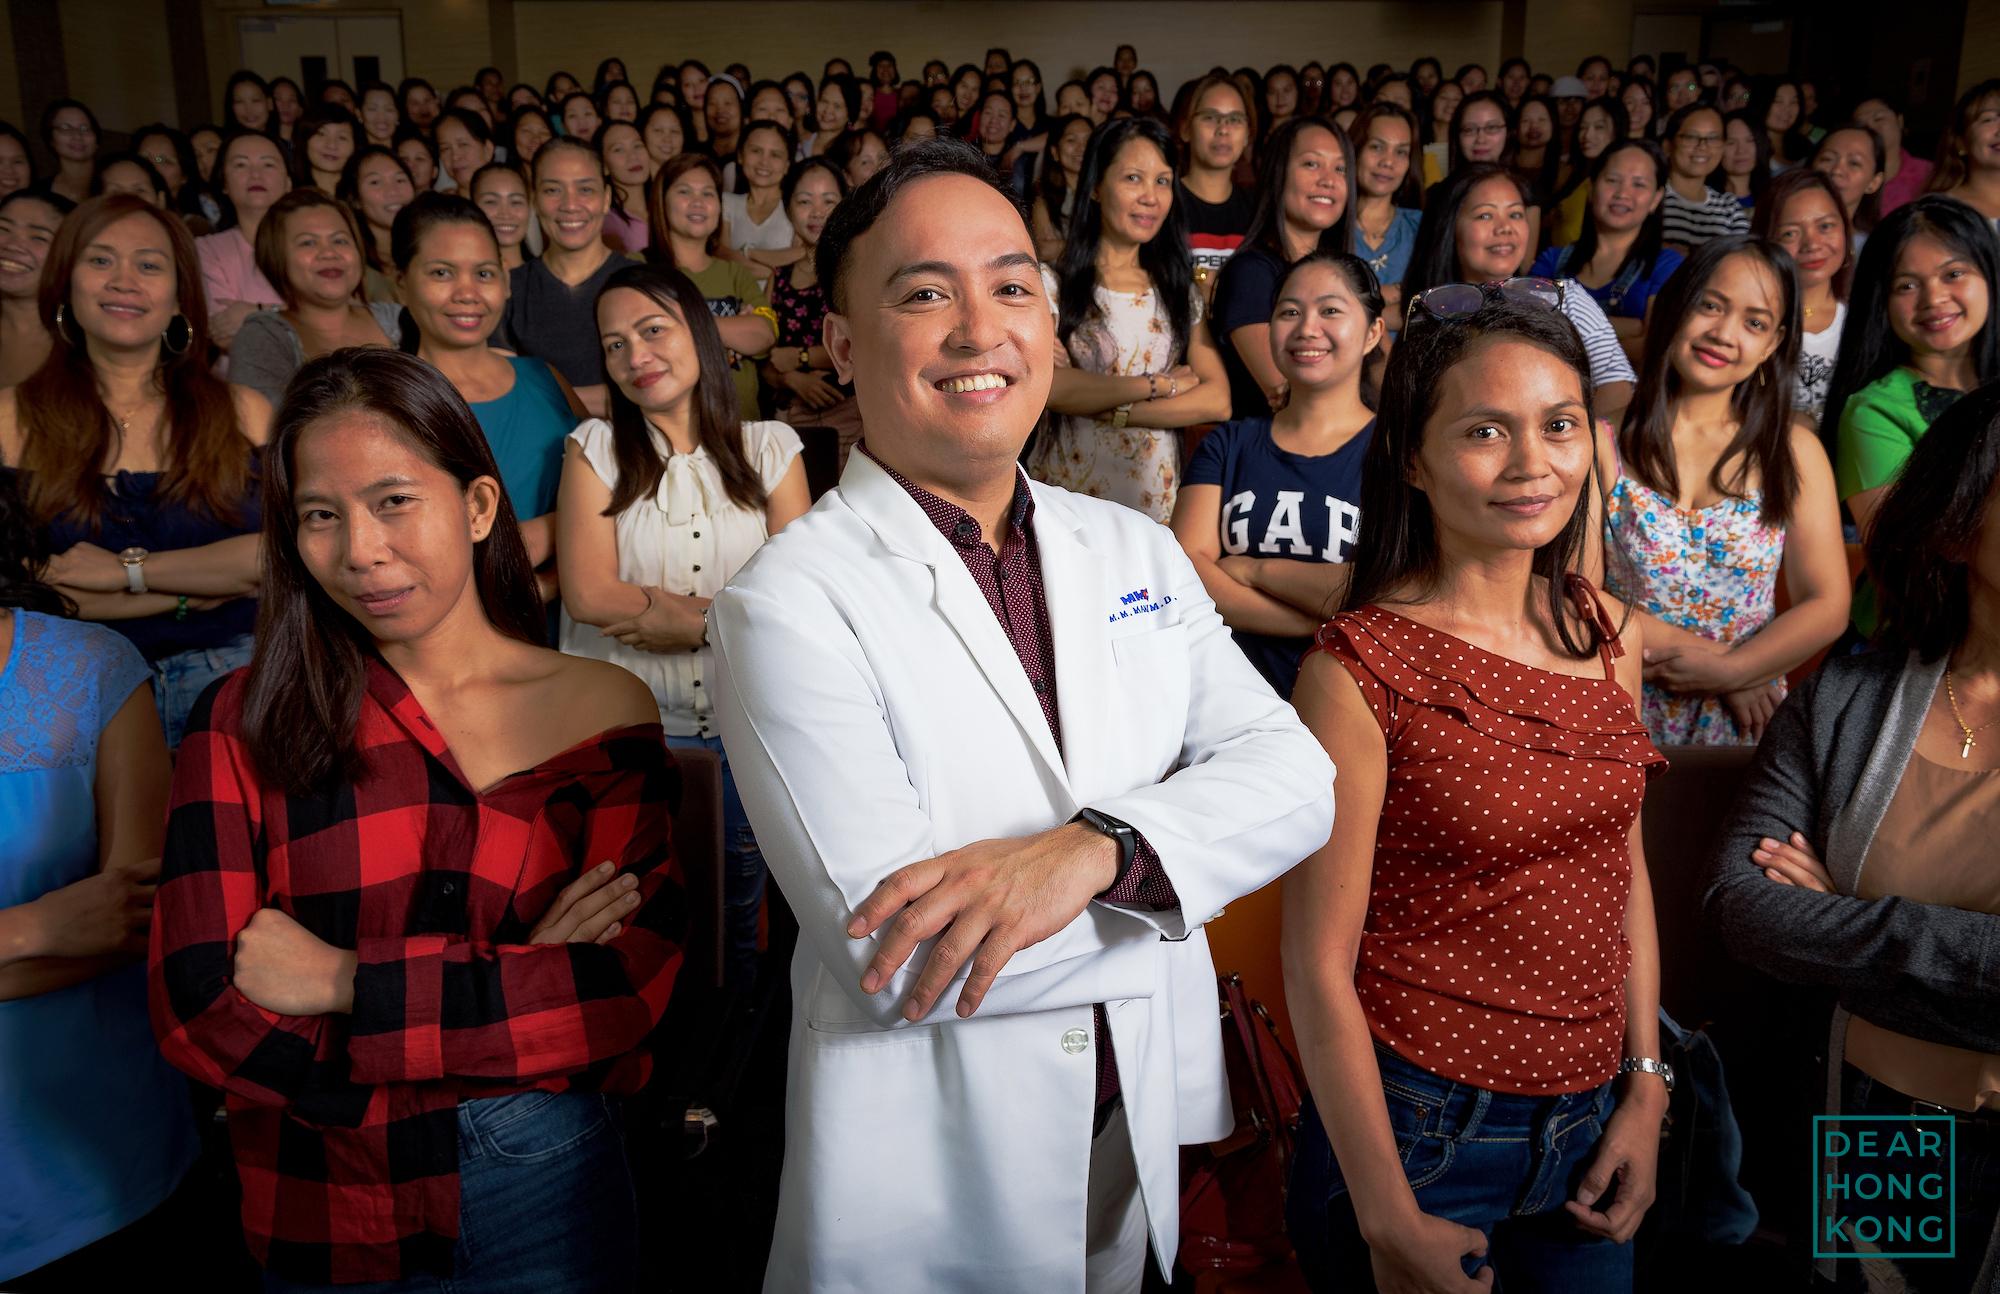 Philippines - Dr. Mike Manio by Bradley Aaron @bradley_aaron_portraits